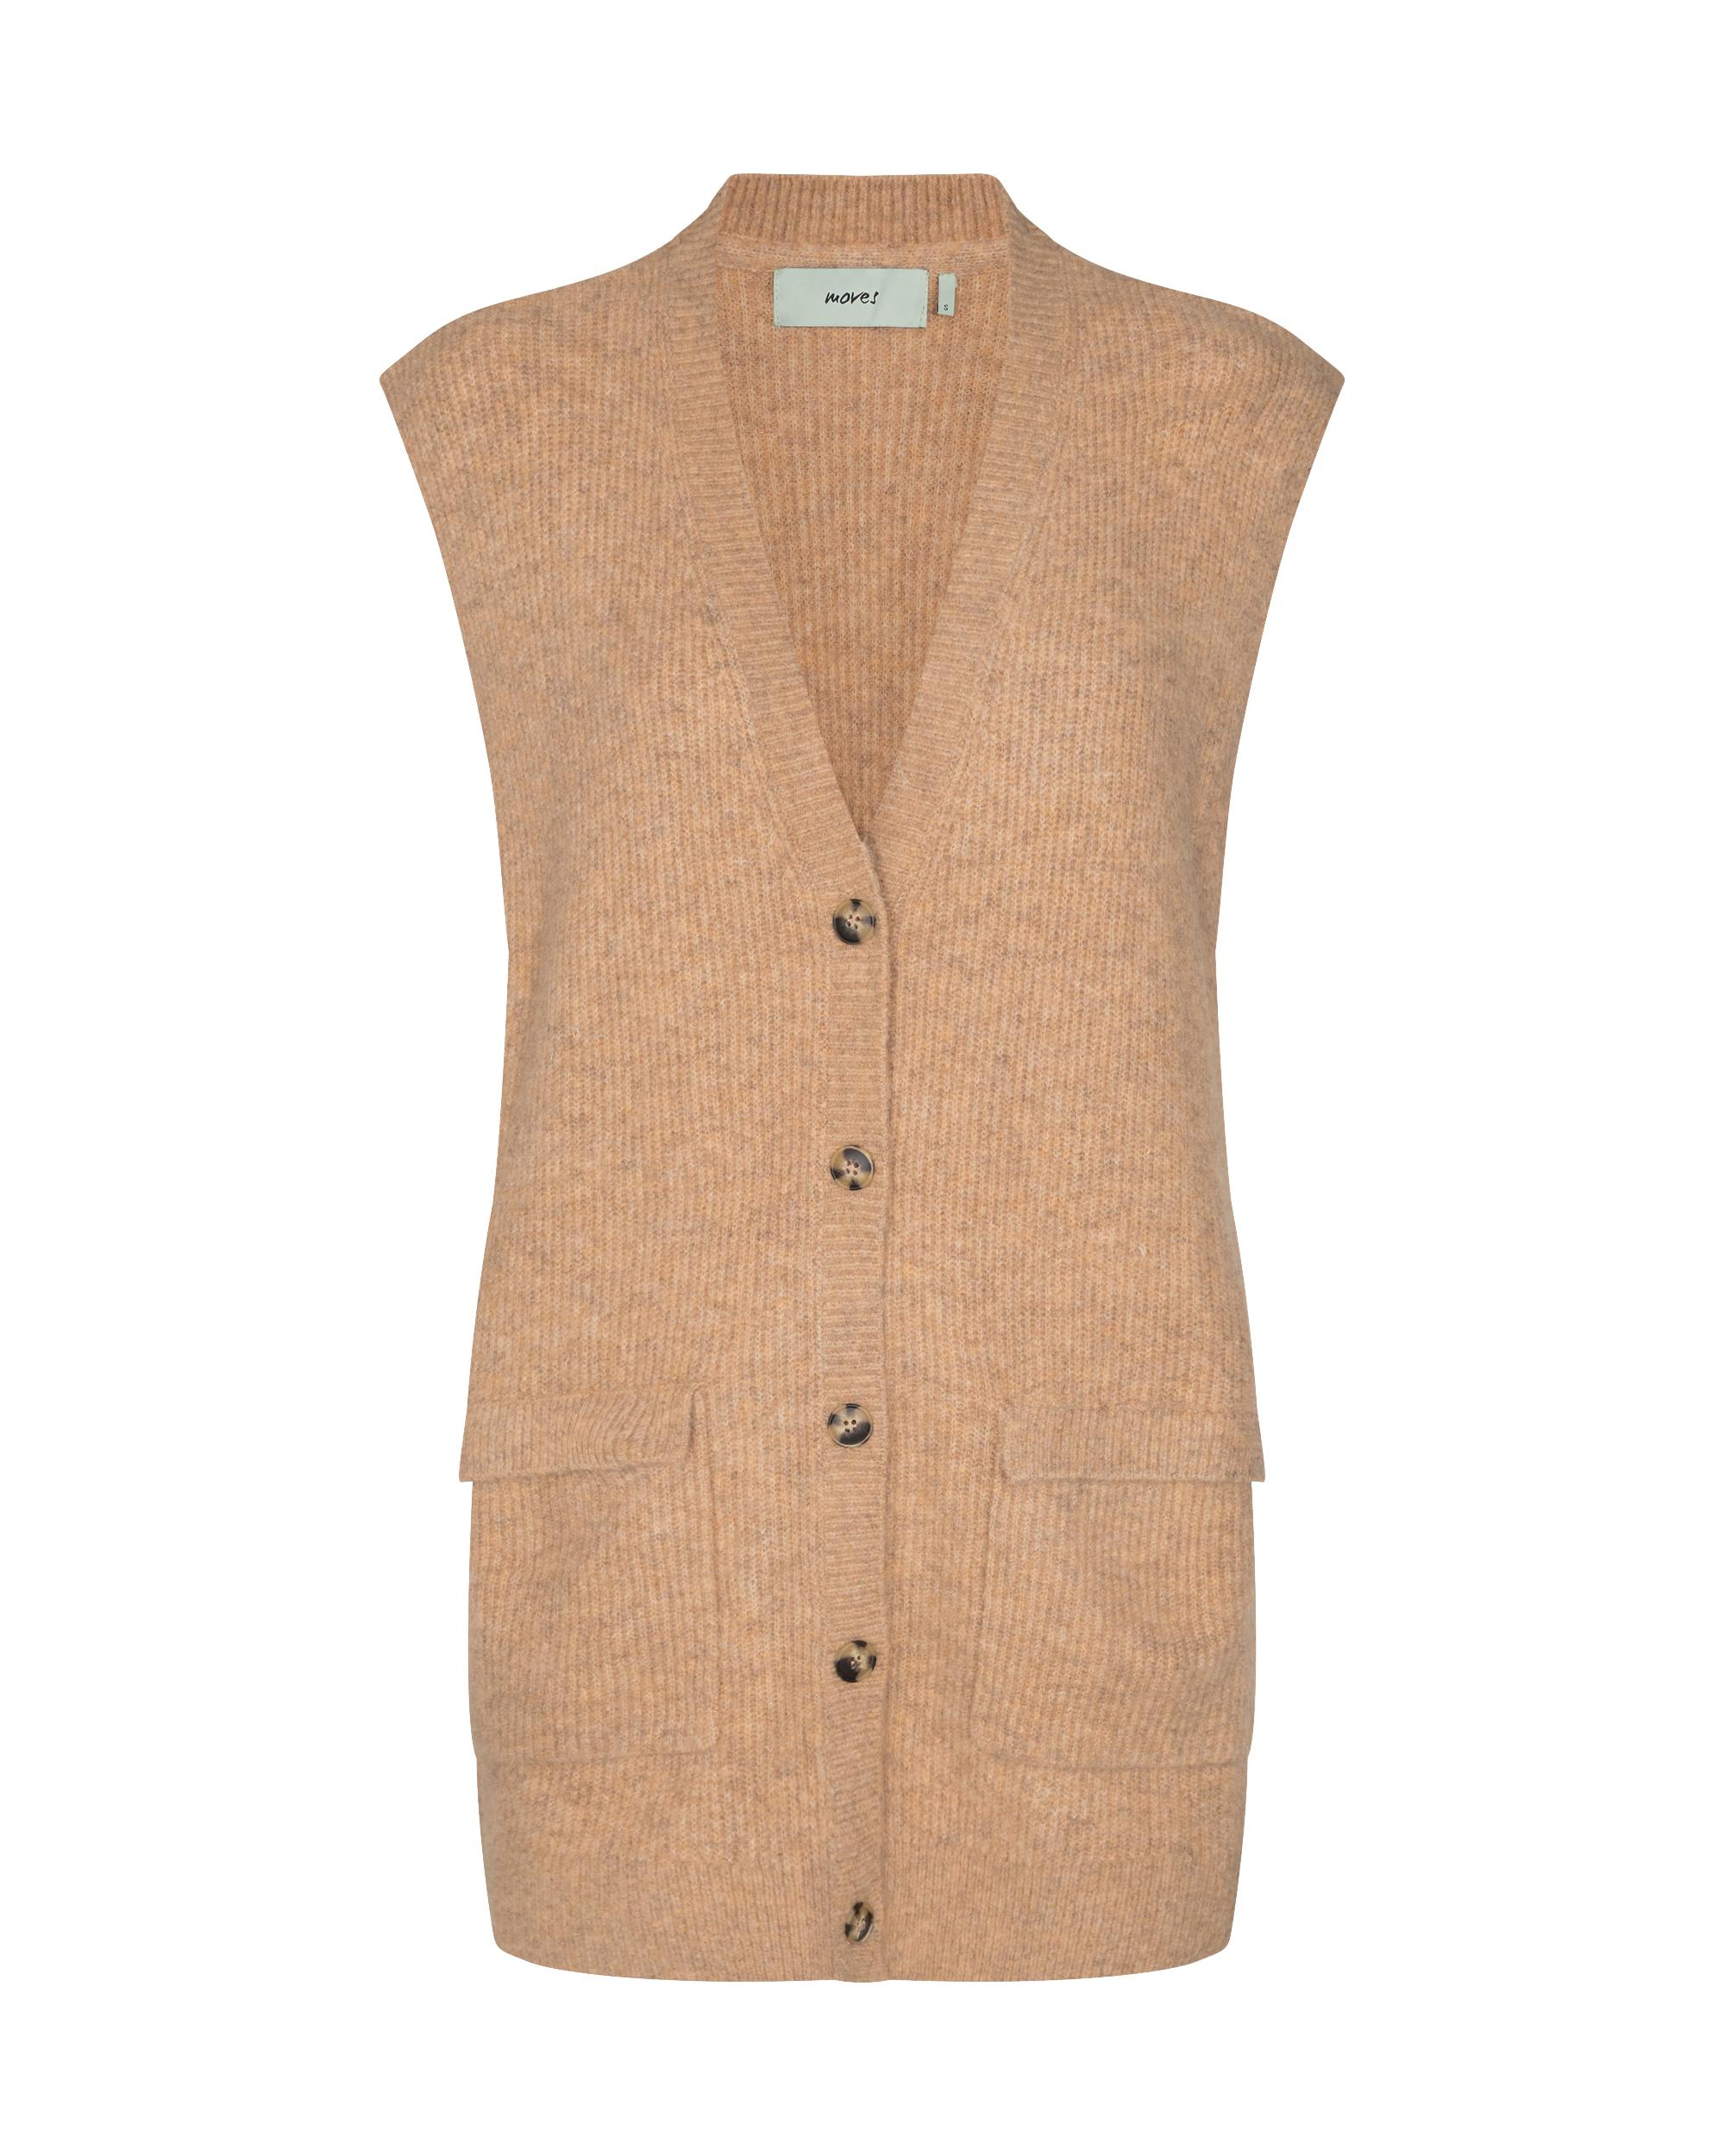 Moves Laerke vest cardigan, ice coffee, x-large